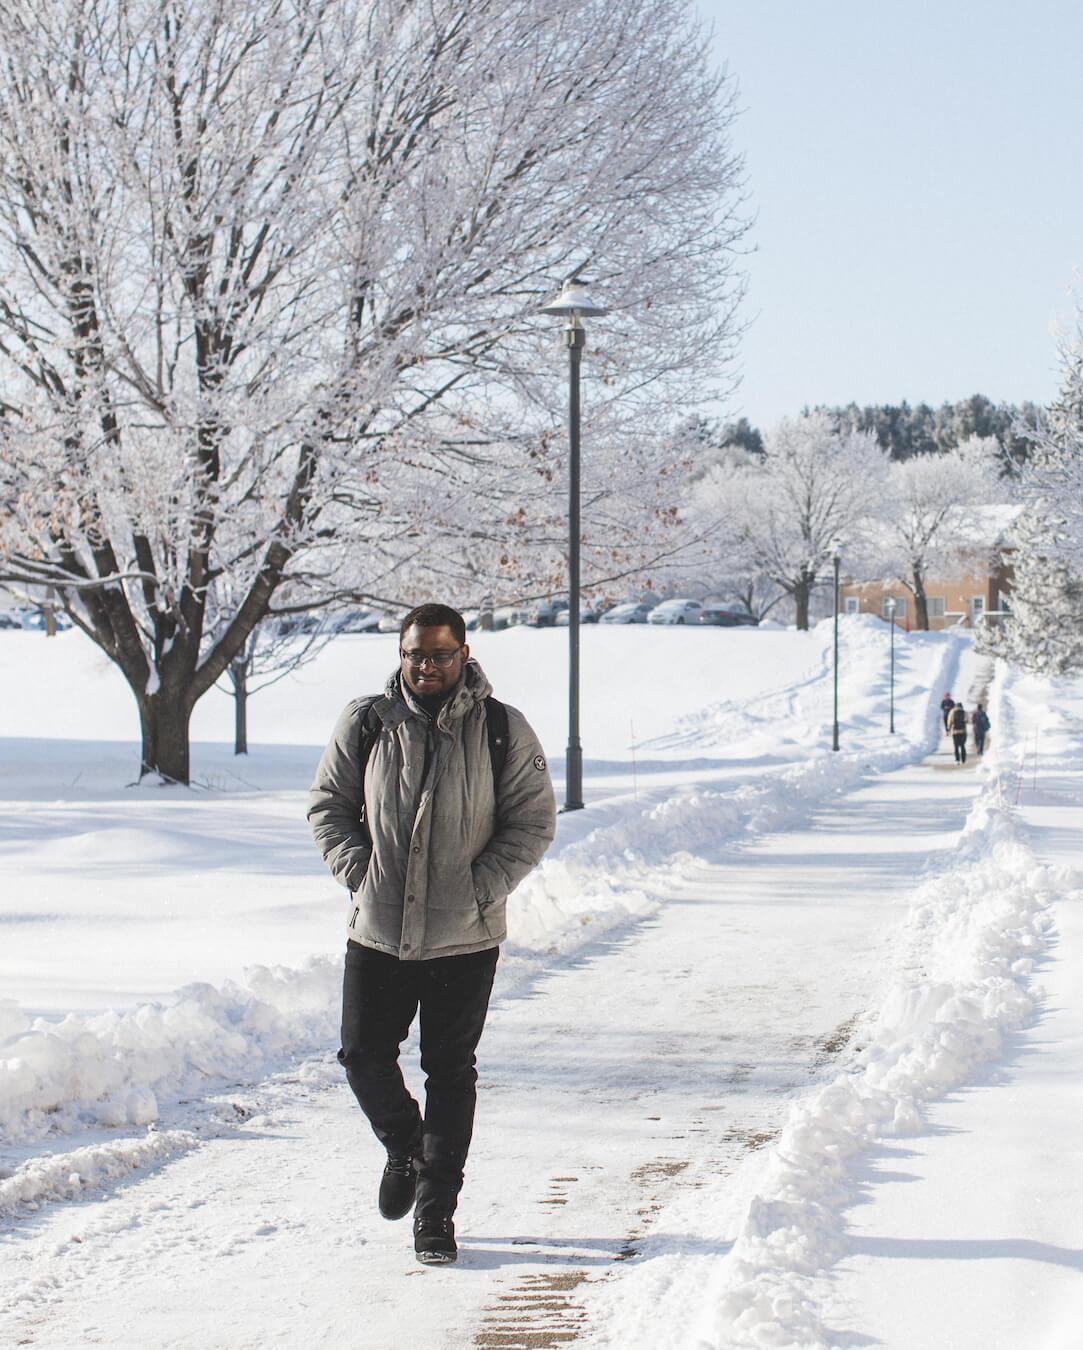 Student_walking_winter